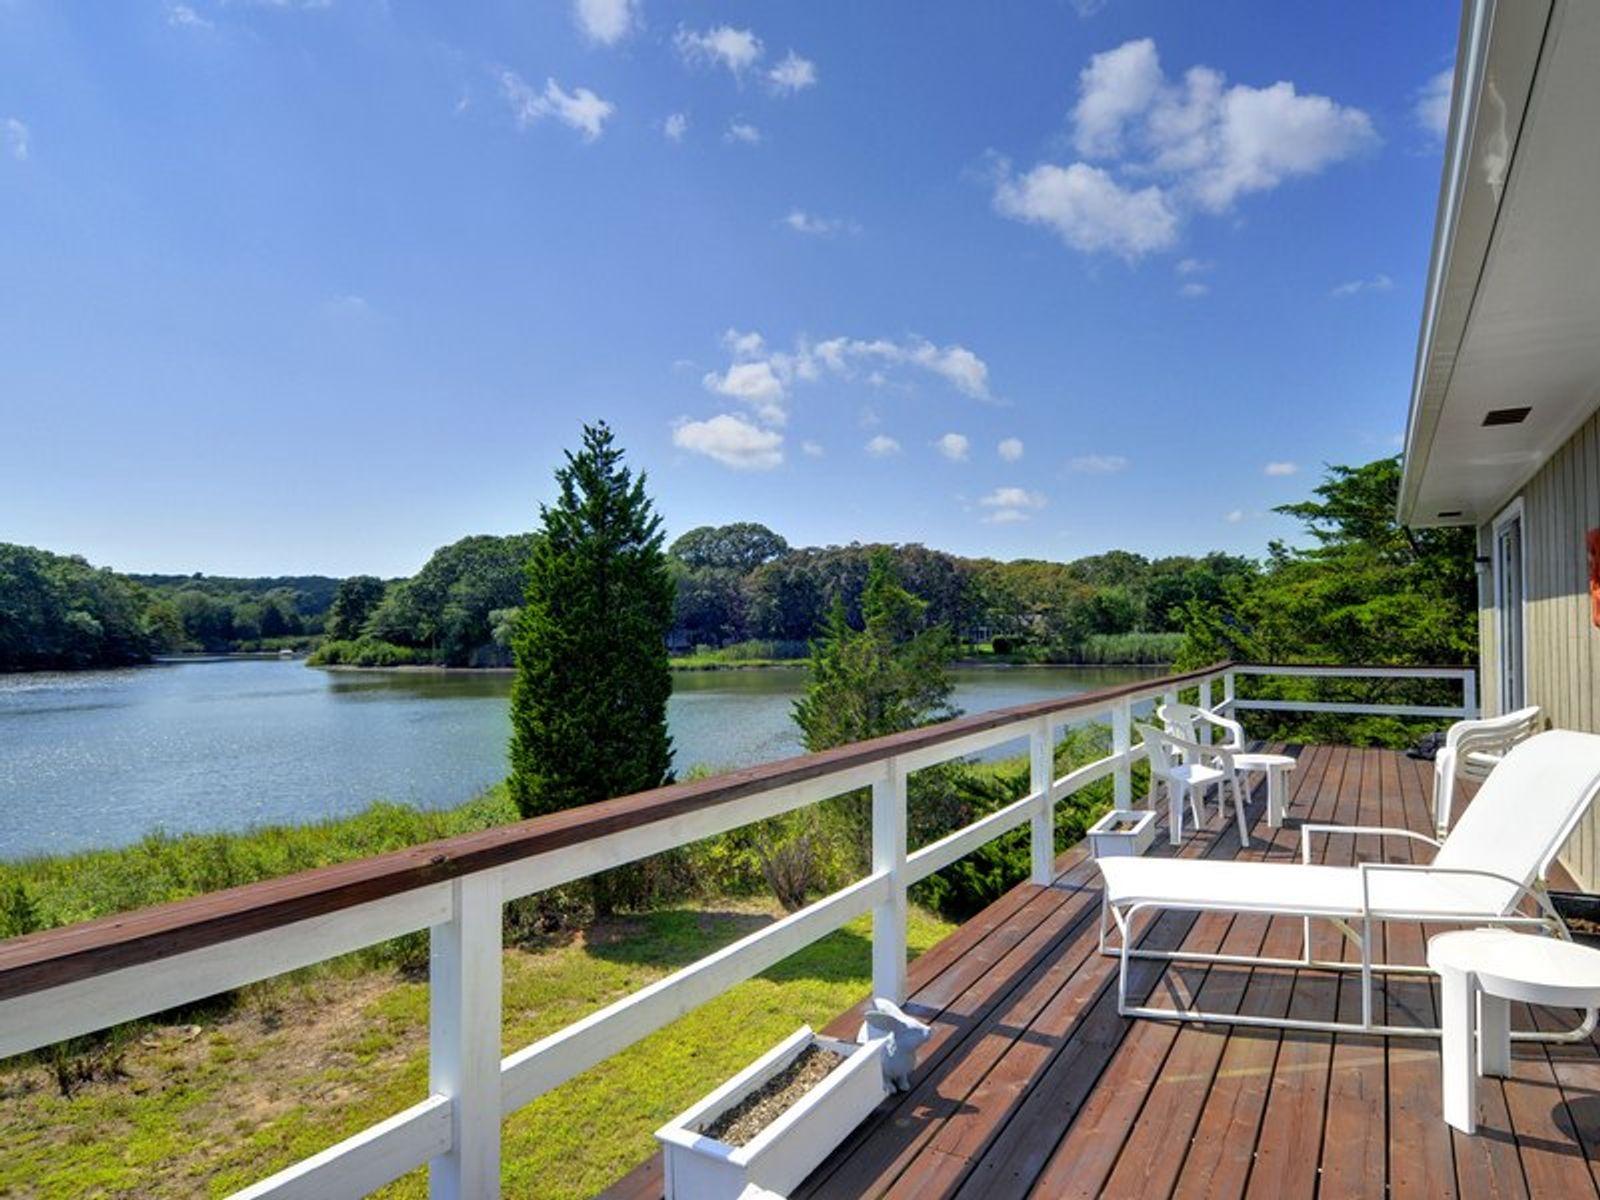 East hampton waterfront east hampton ny single family for Homes for sale east hampton ny